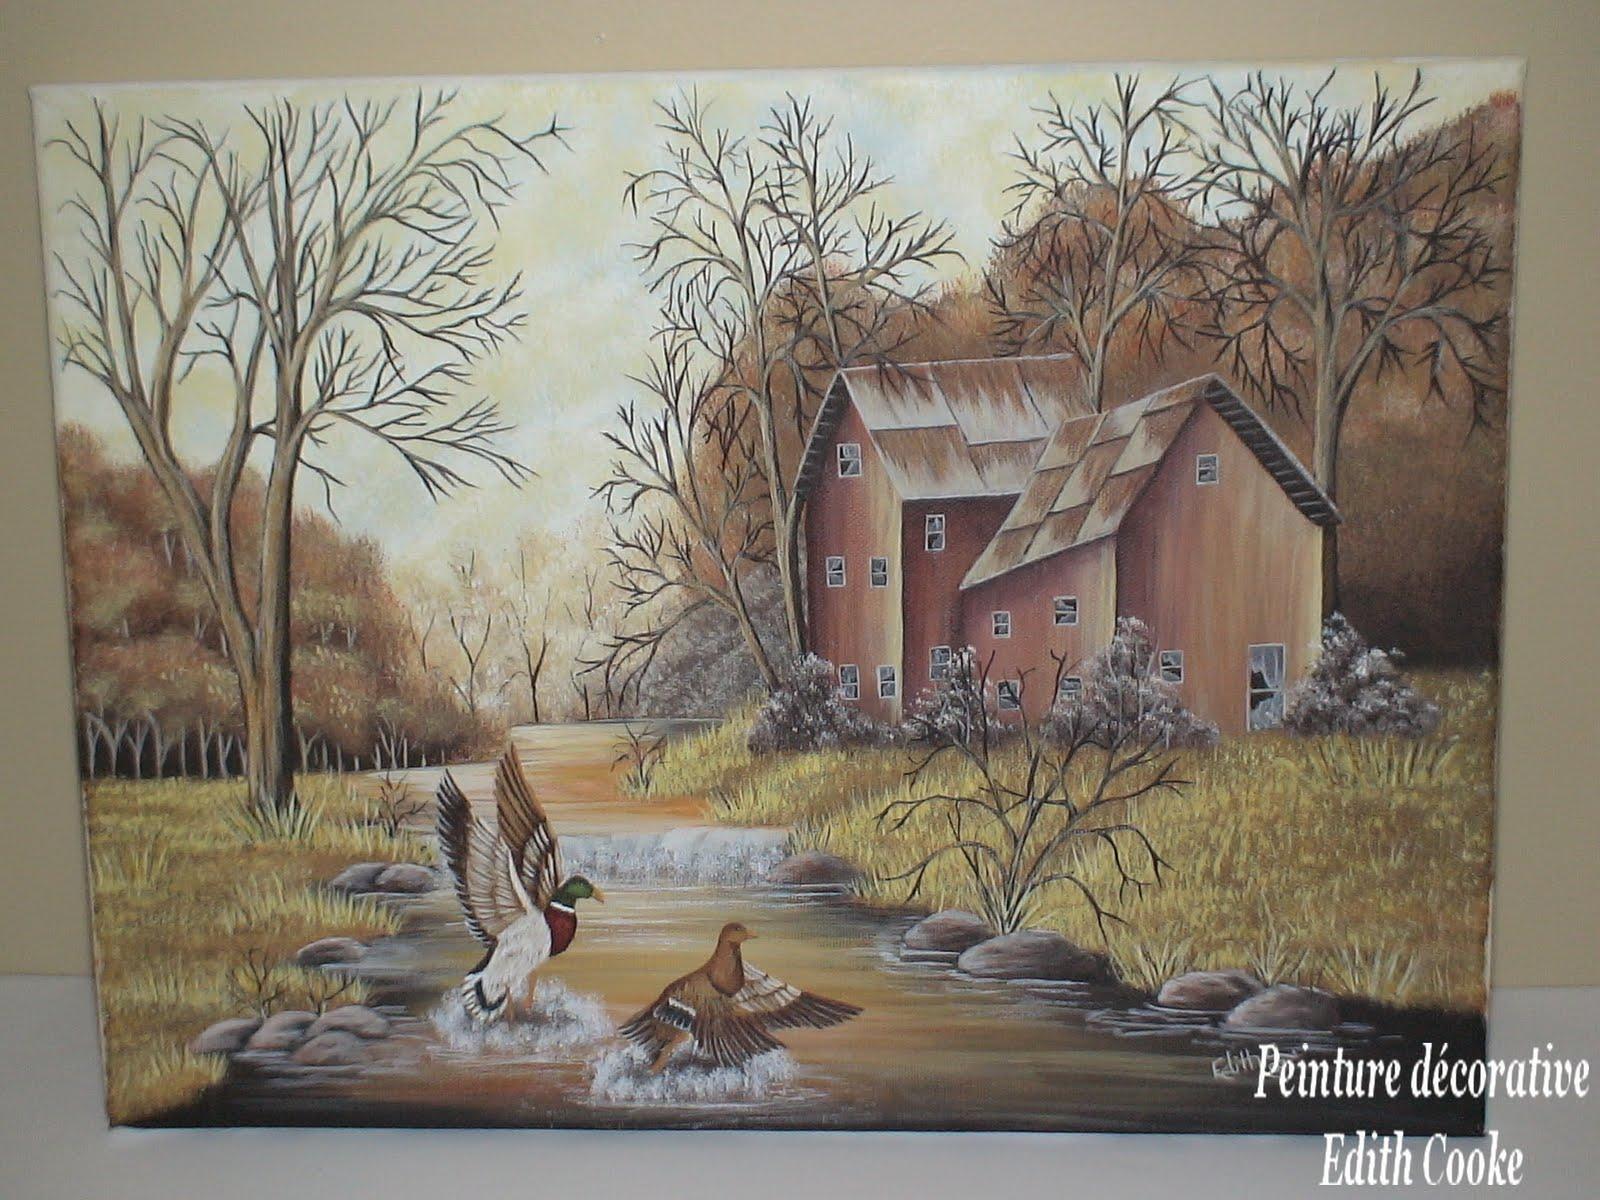 Peinture d corative edith cooke toile de canards for Modele de peinture decorative